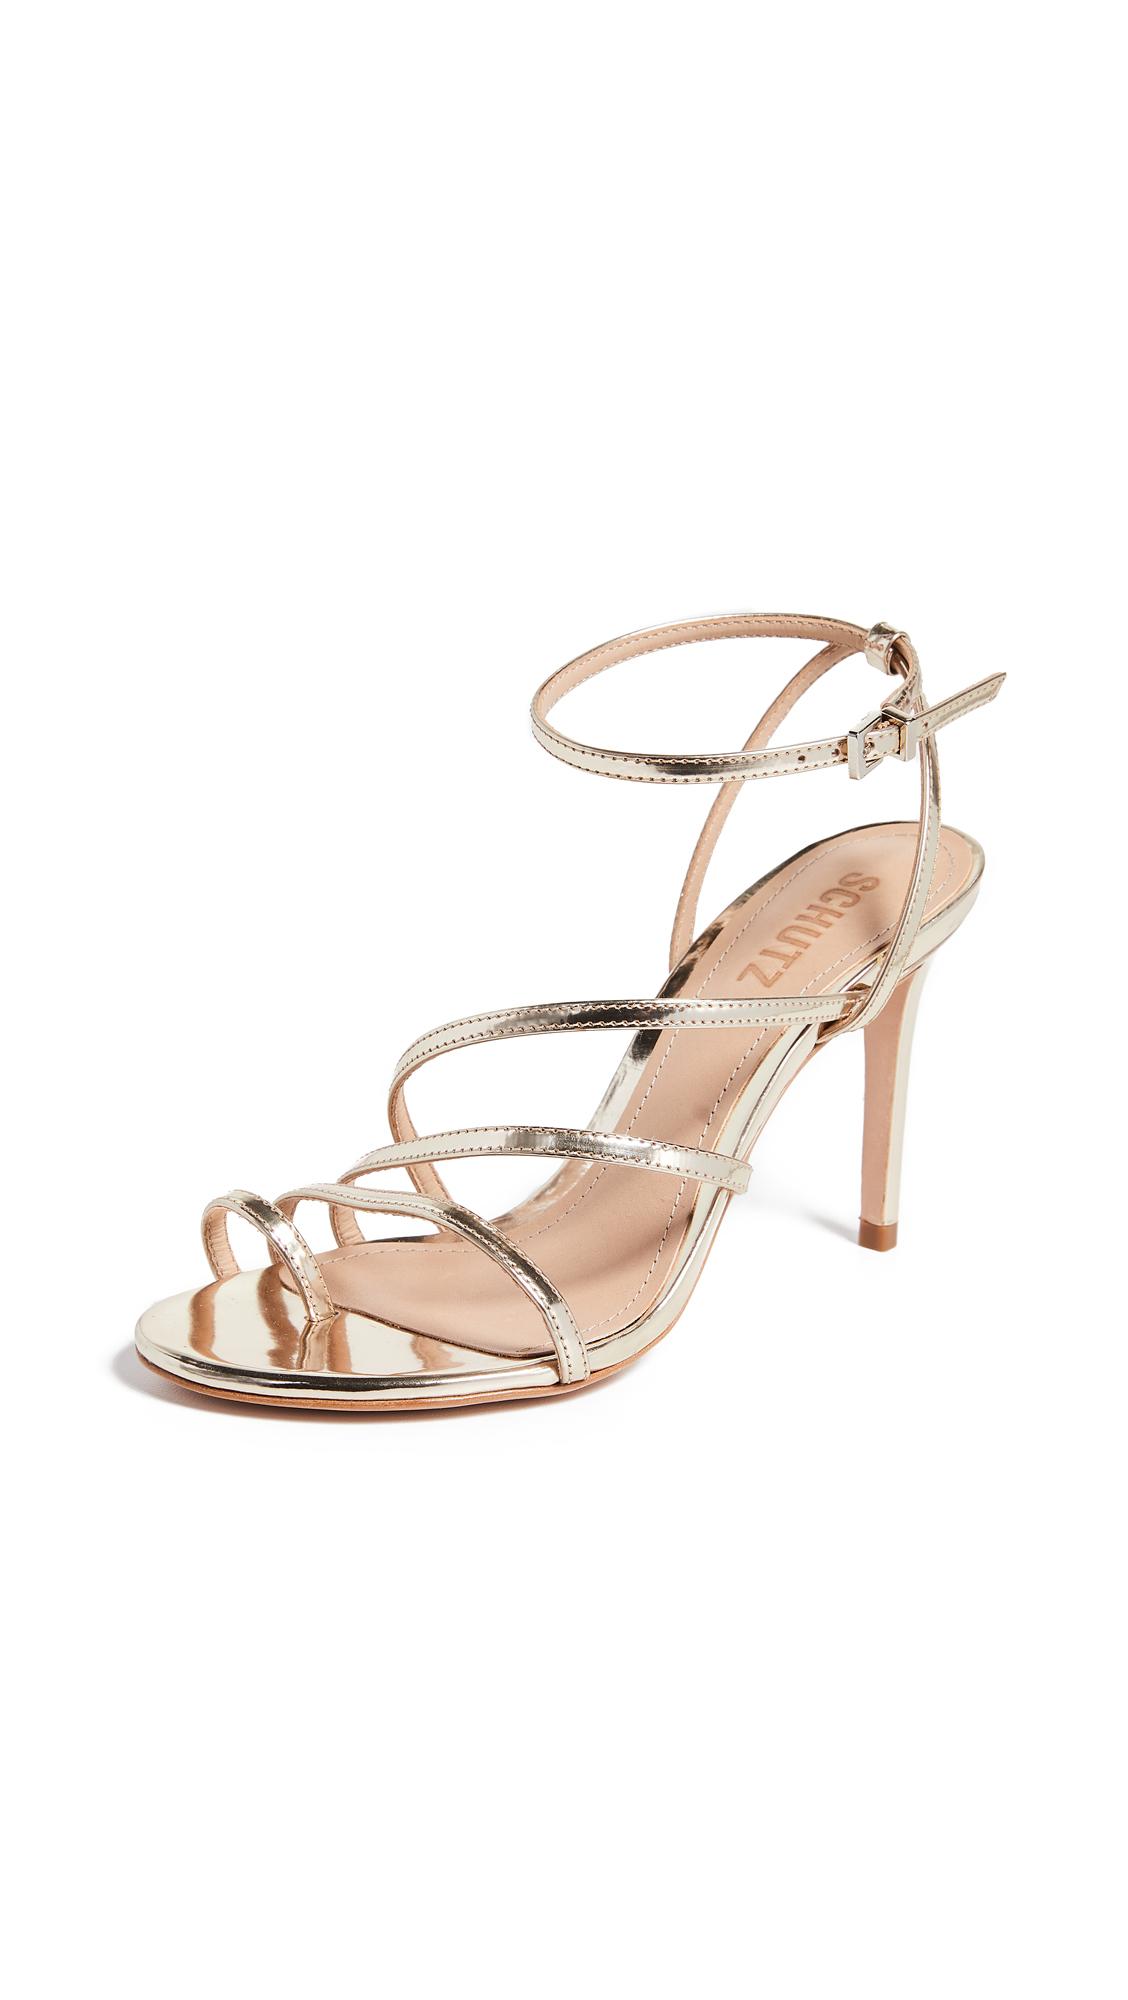 Schutz Raona Strappy Sandals - Platina